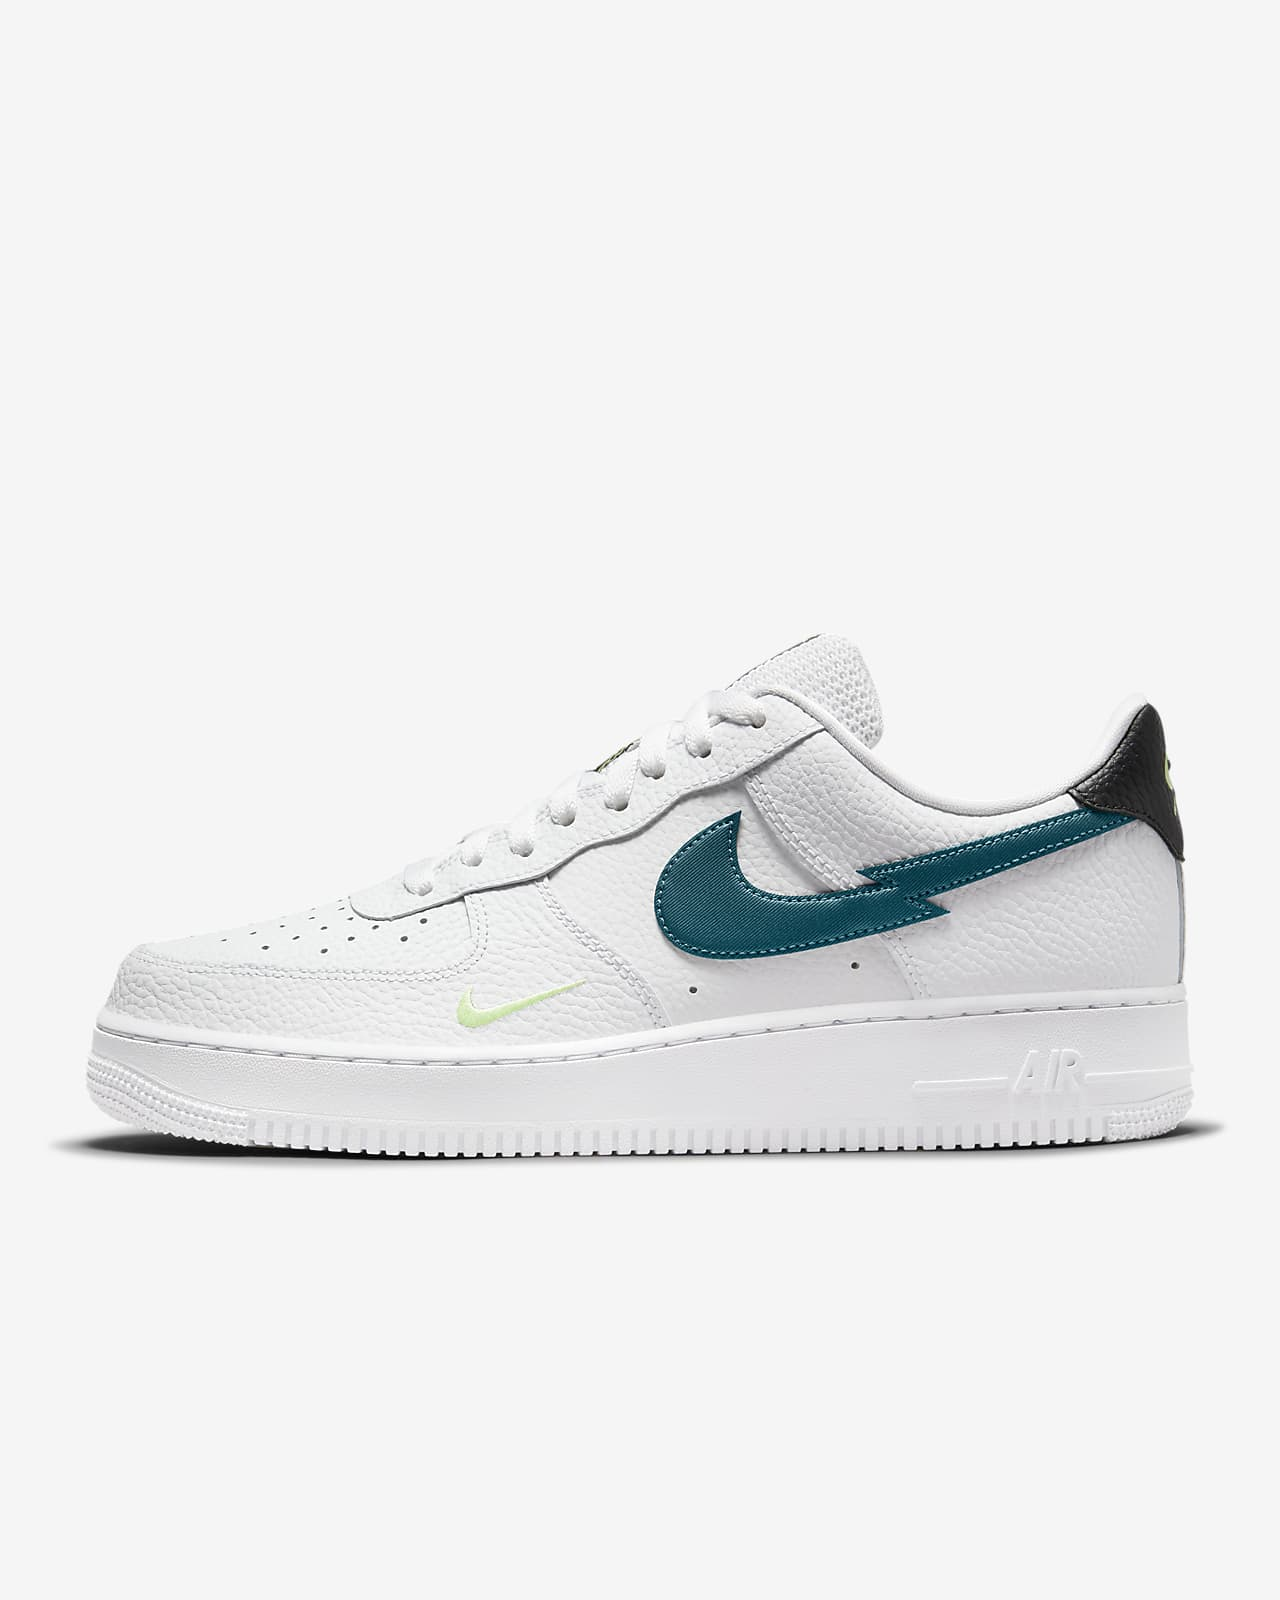 Nike Air Force 1 Low Shoe